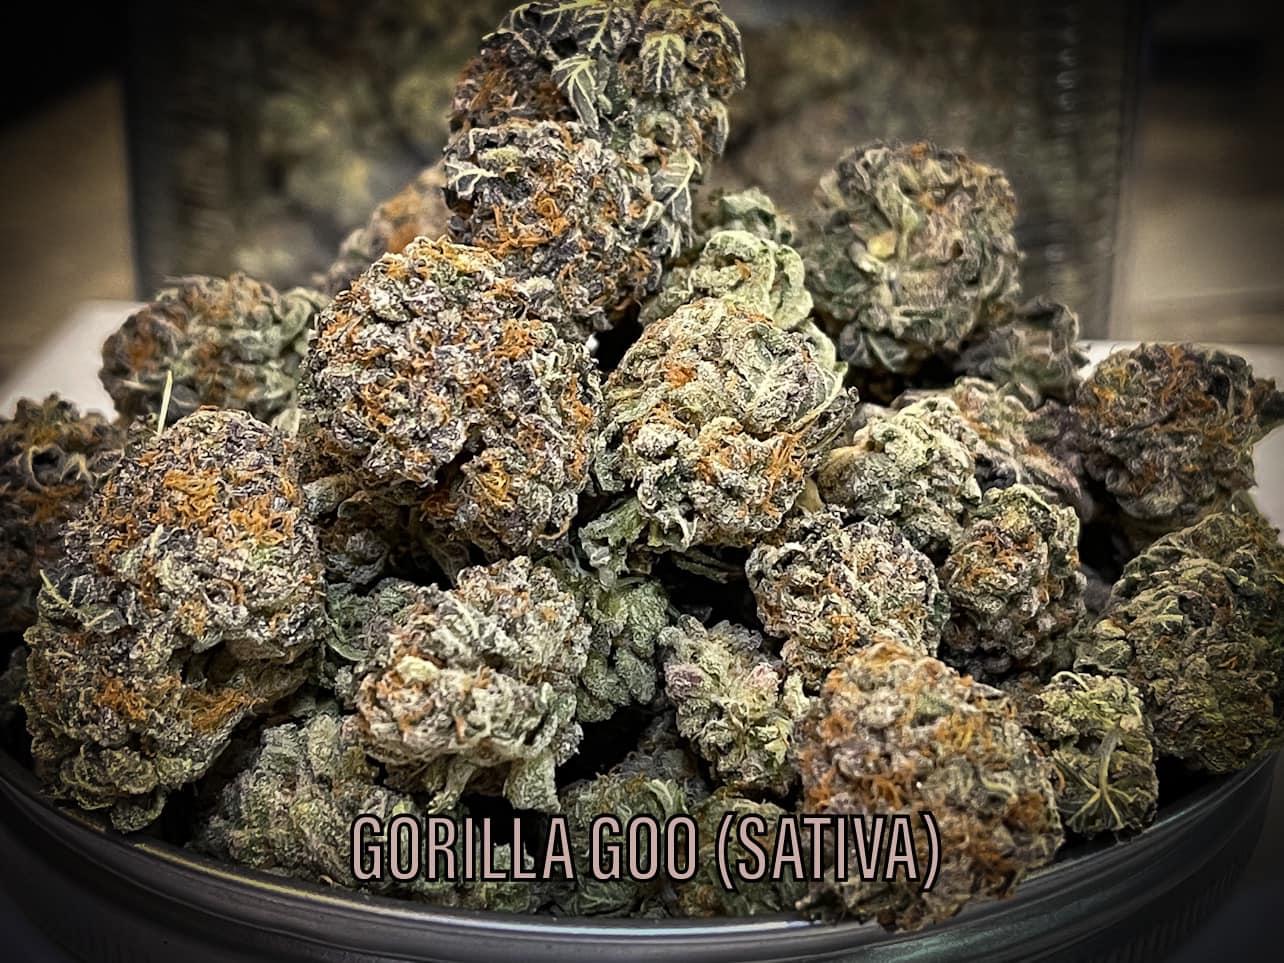 gorilla goo sativa strain for energy dispensary tucson